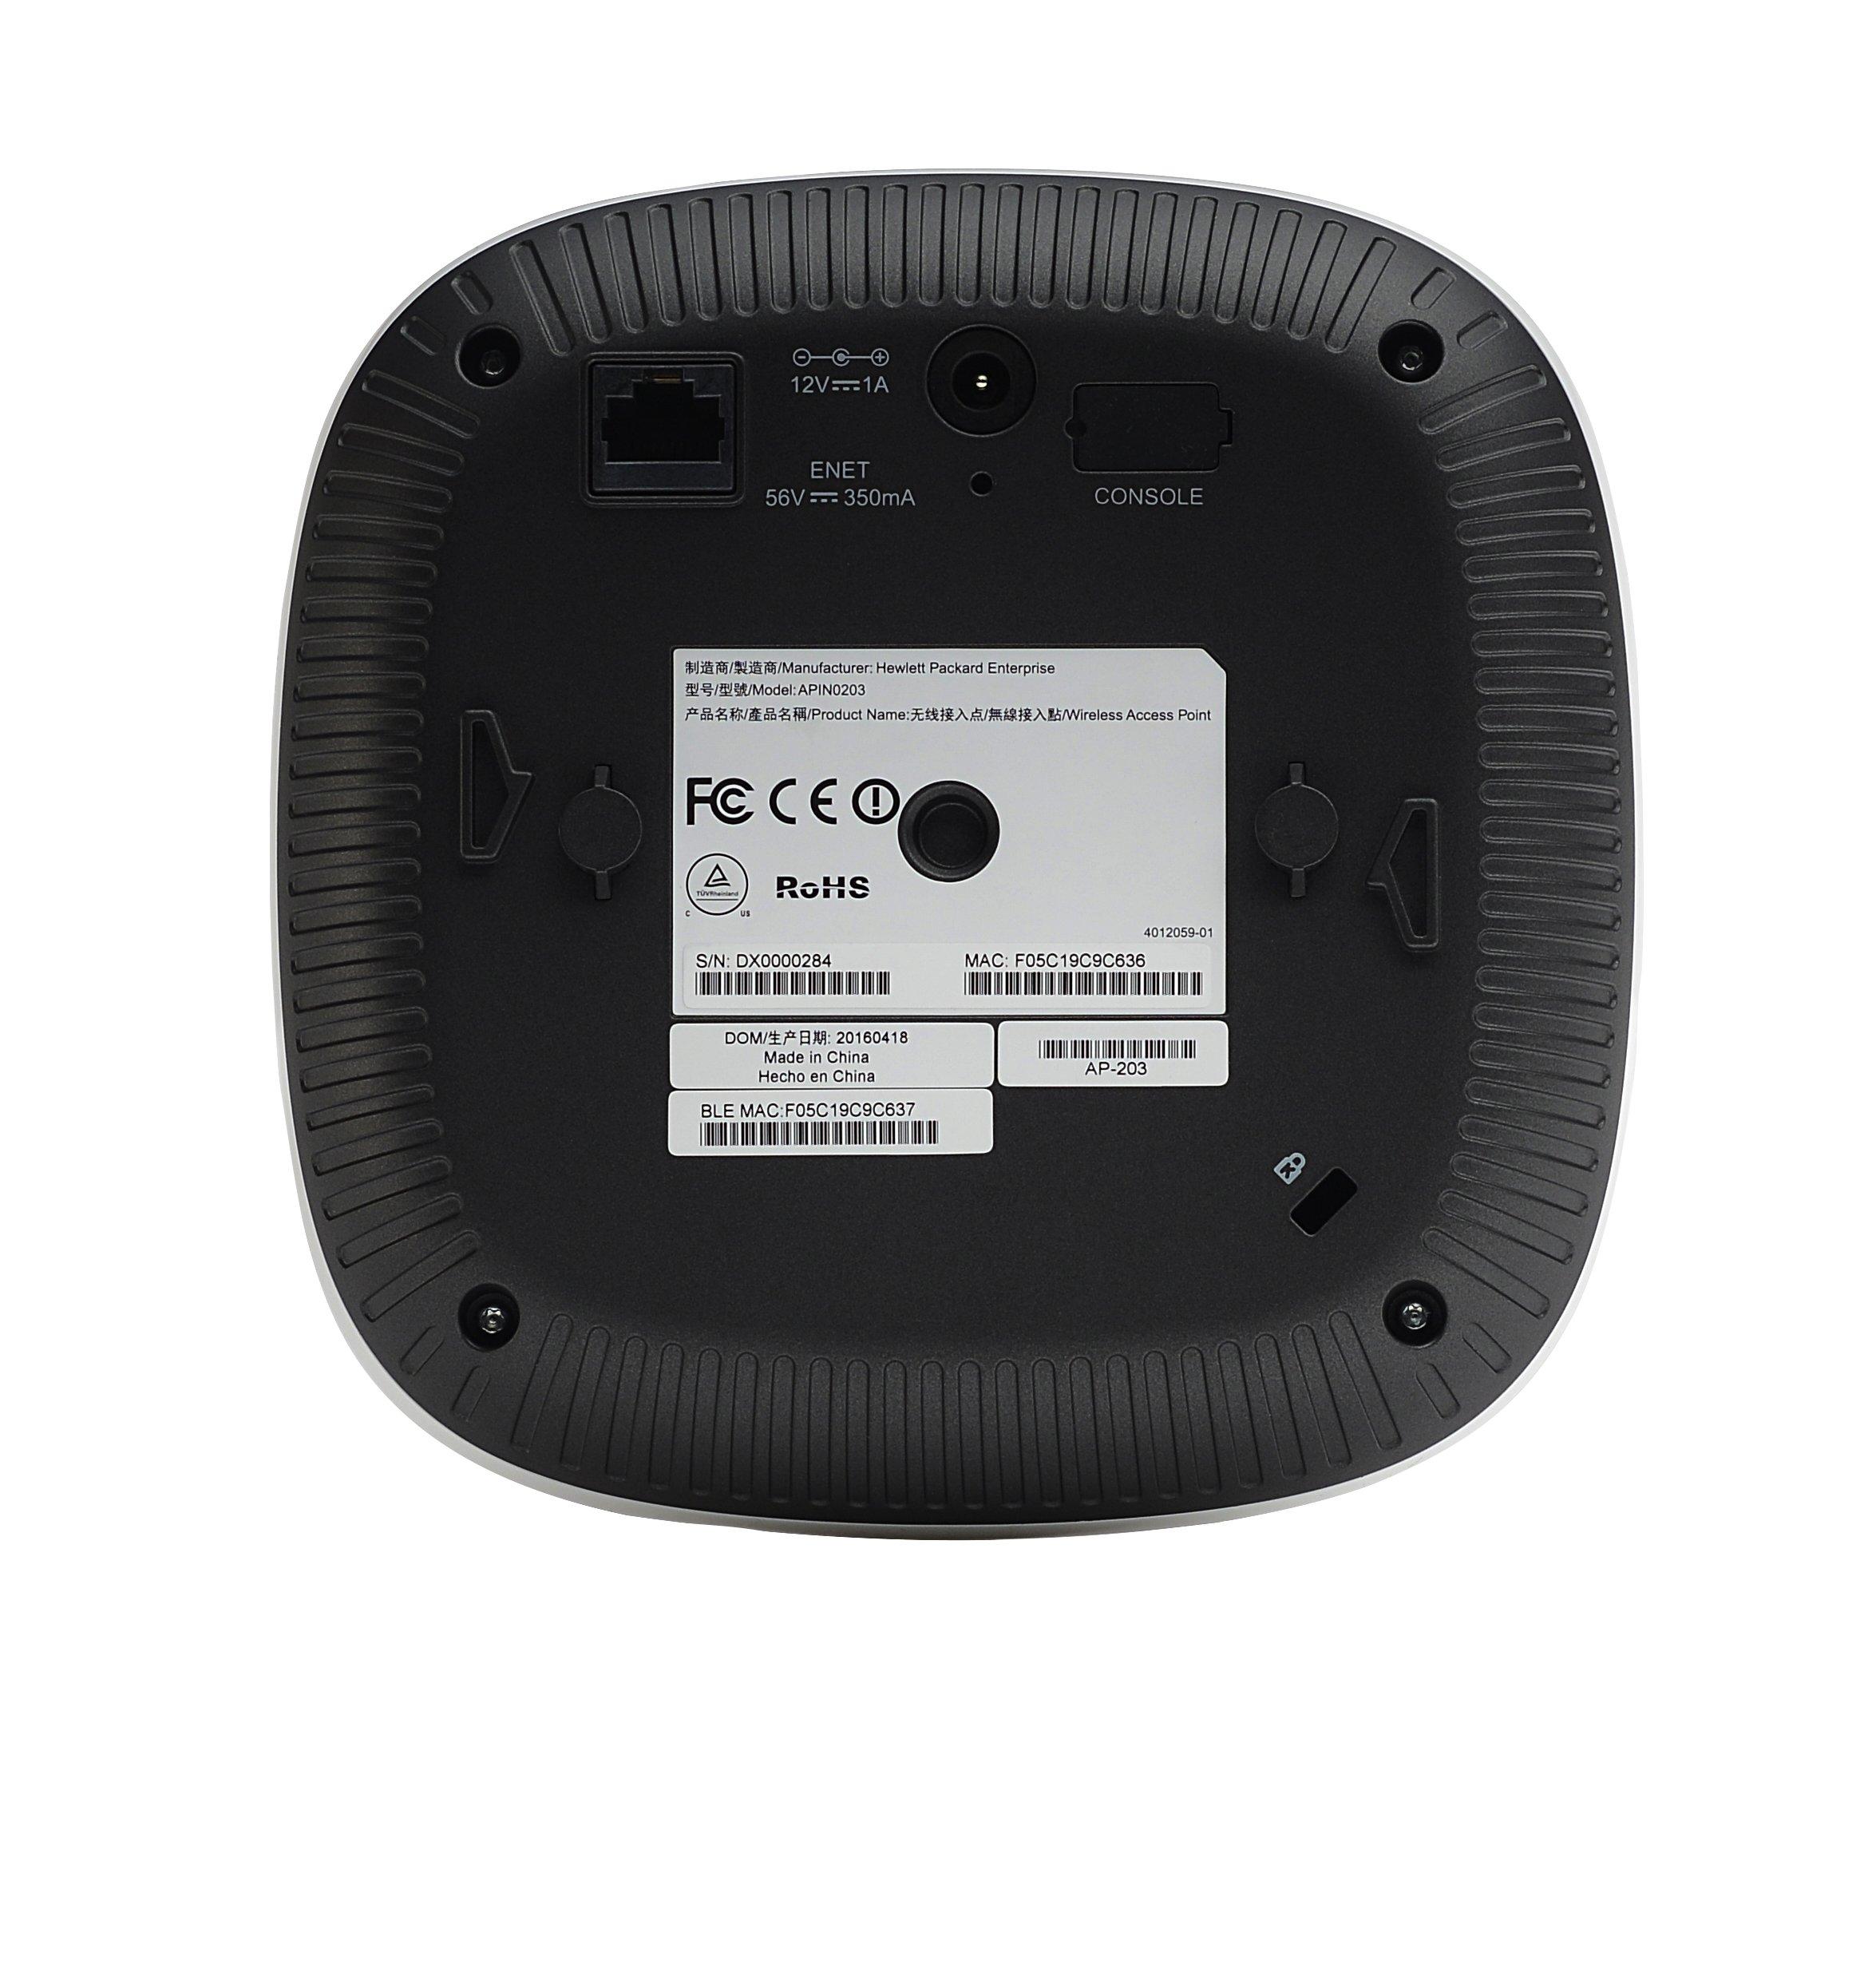 Aruba IAP-207 (RW) 802 11n/ac Dual 2x2:2 Radio Integrated